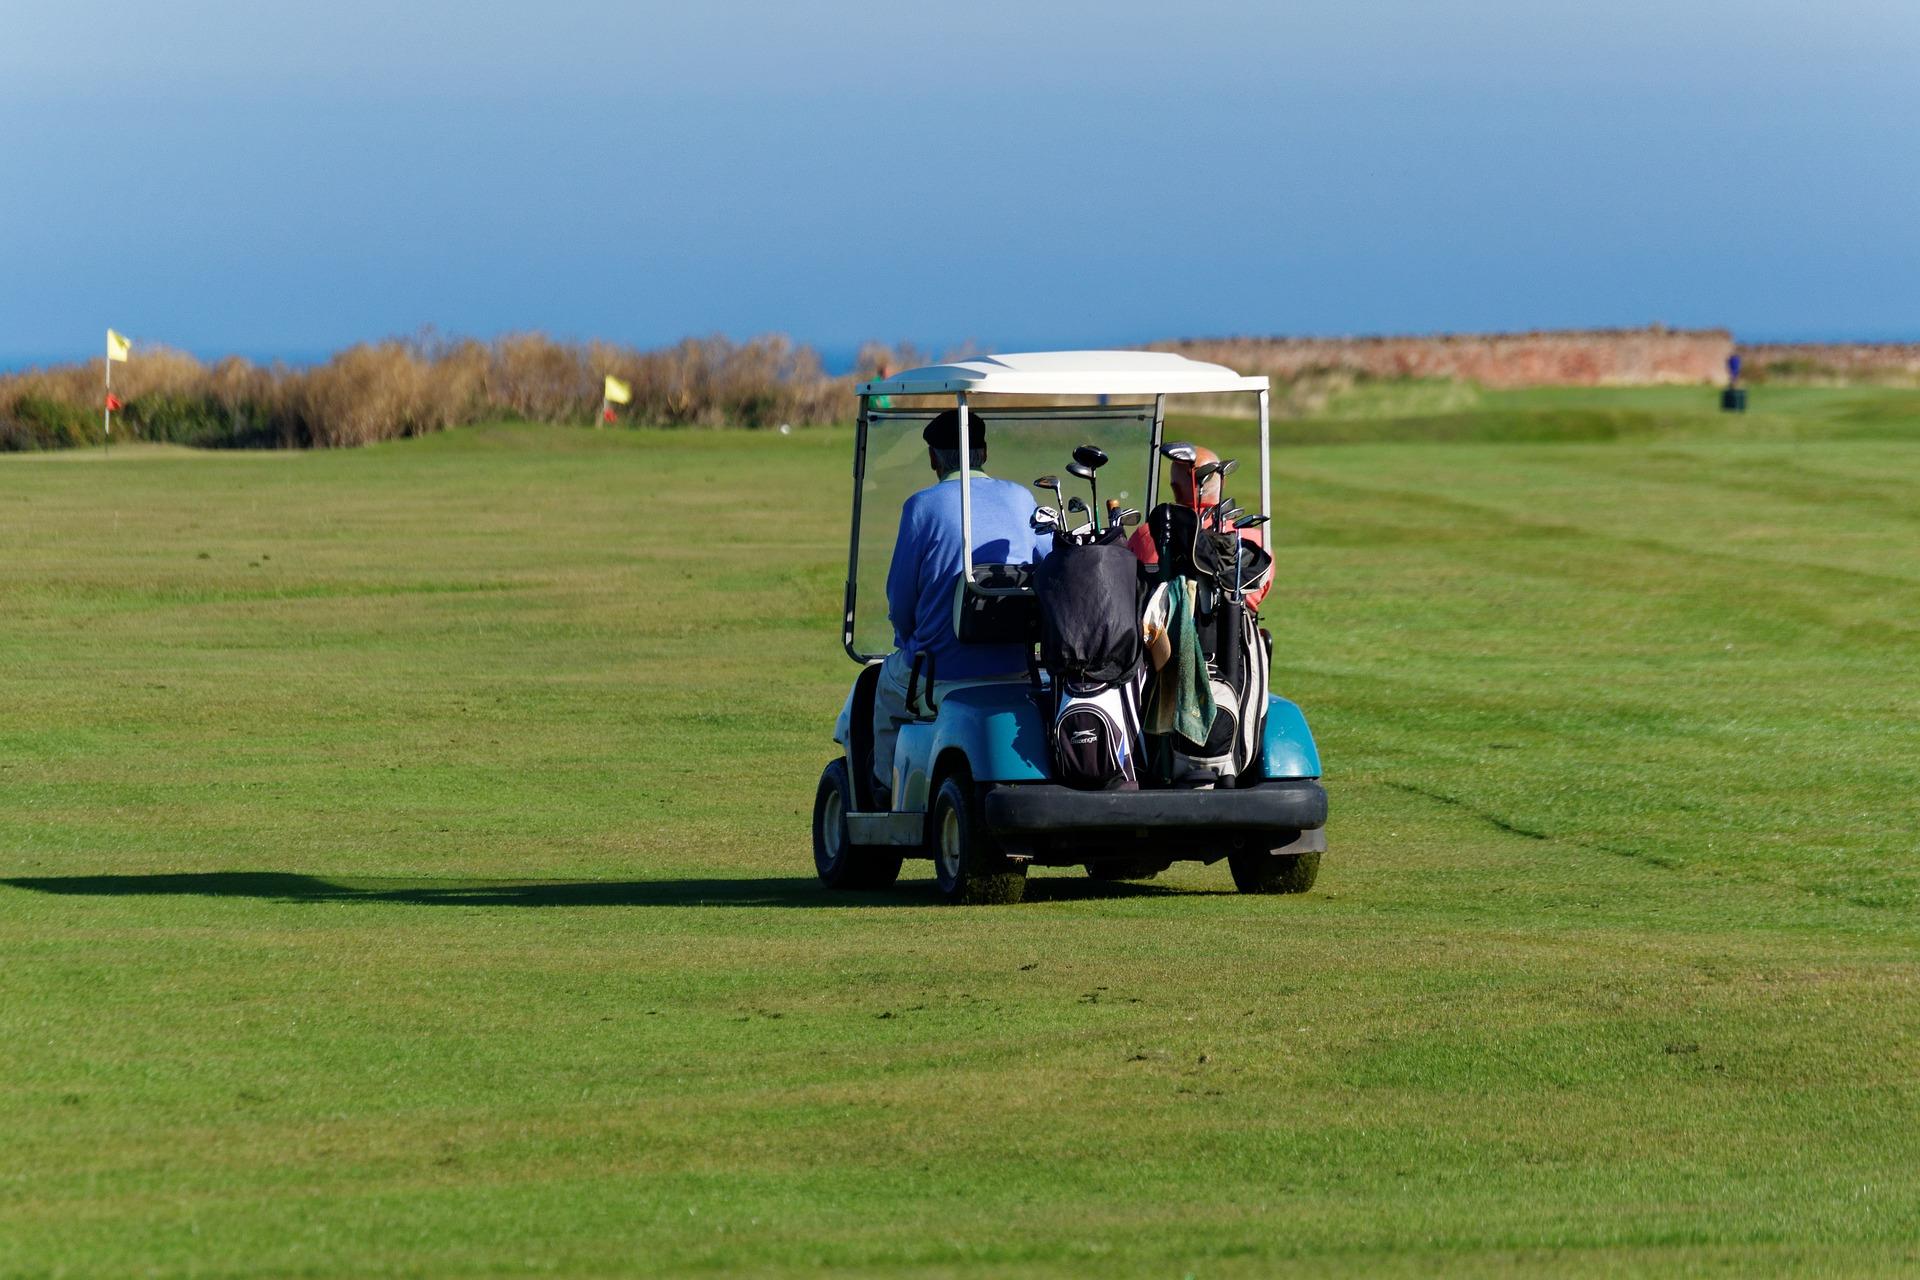 Golf Course Buggy